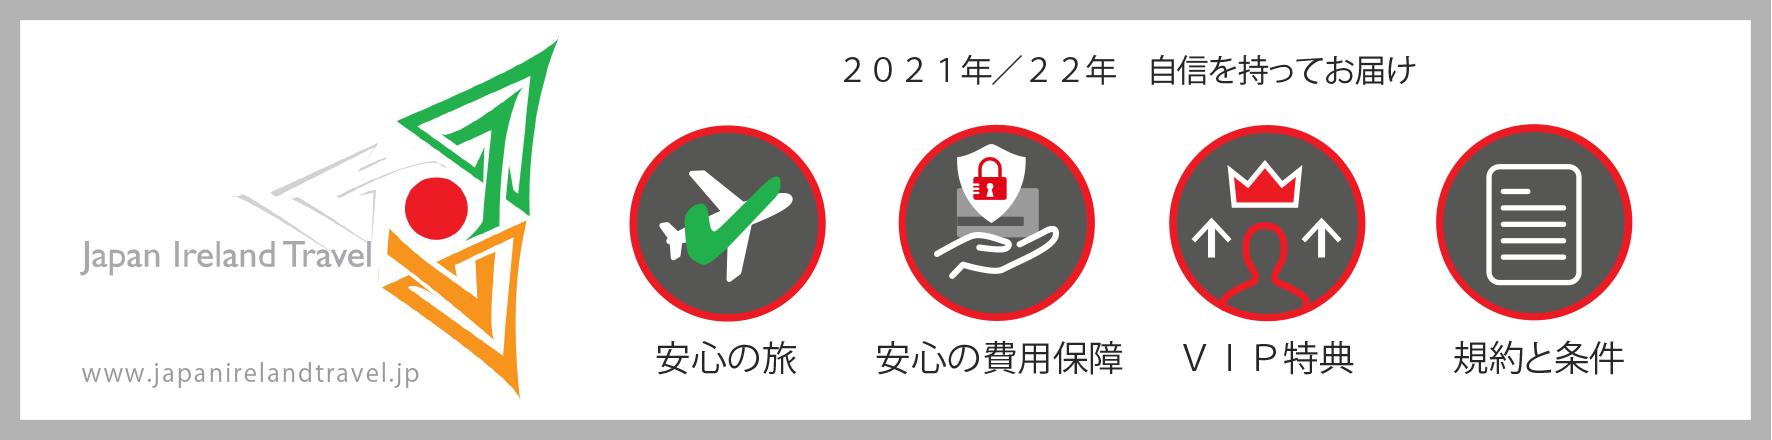 JIT_Travel_Icons_Strip[1]